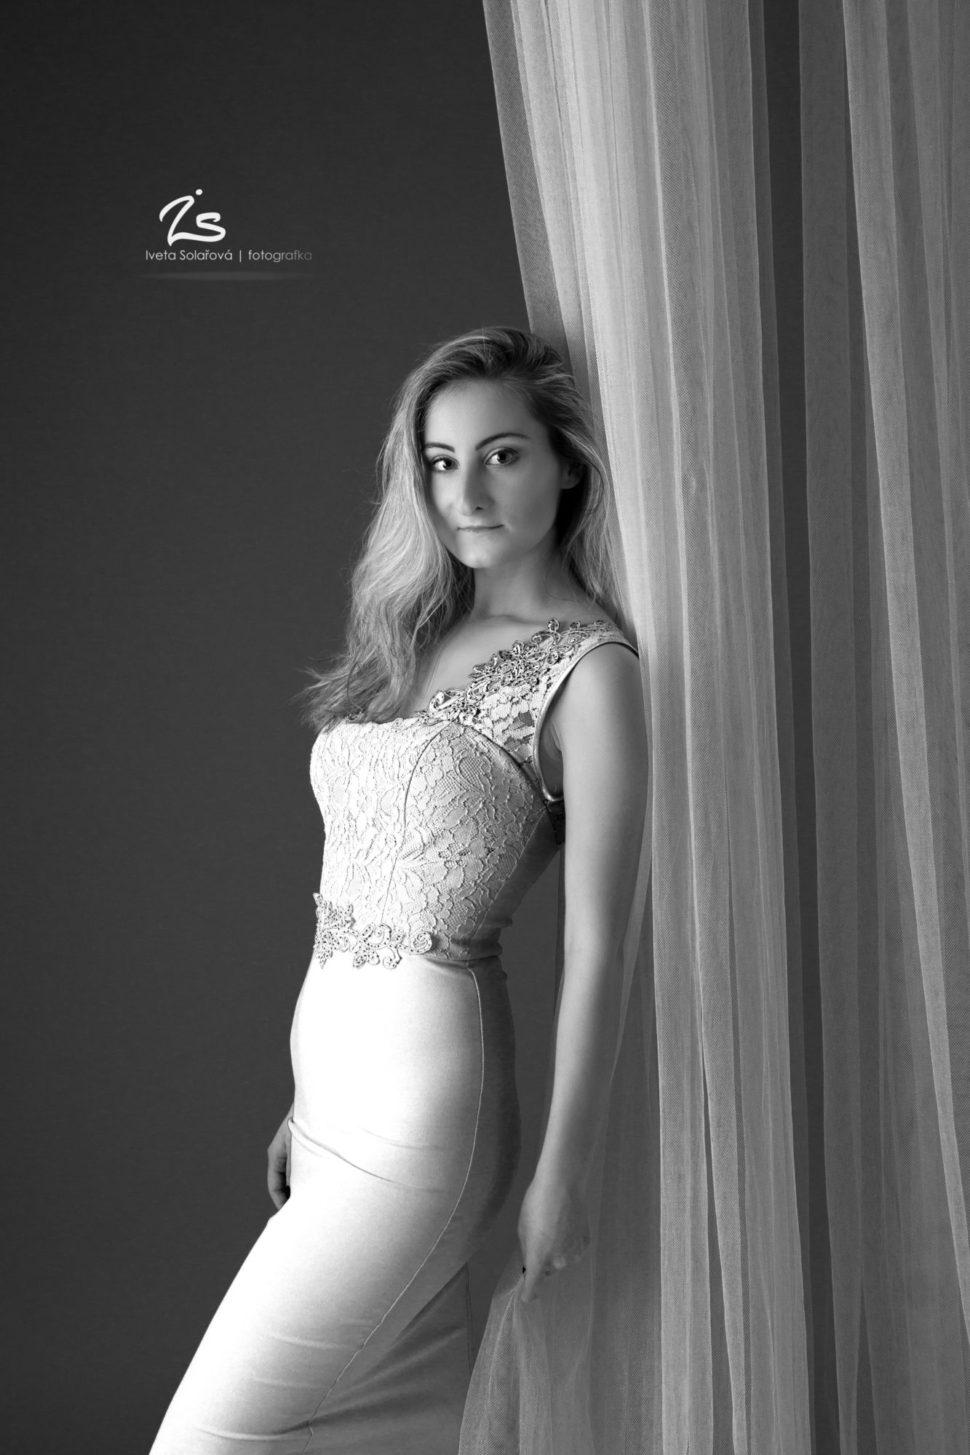 Krásná žena černobílé focení Iveta Solařová